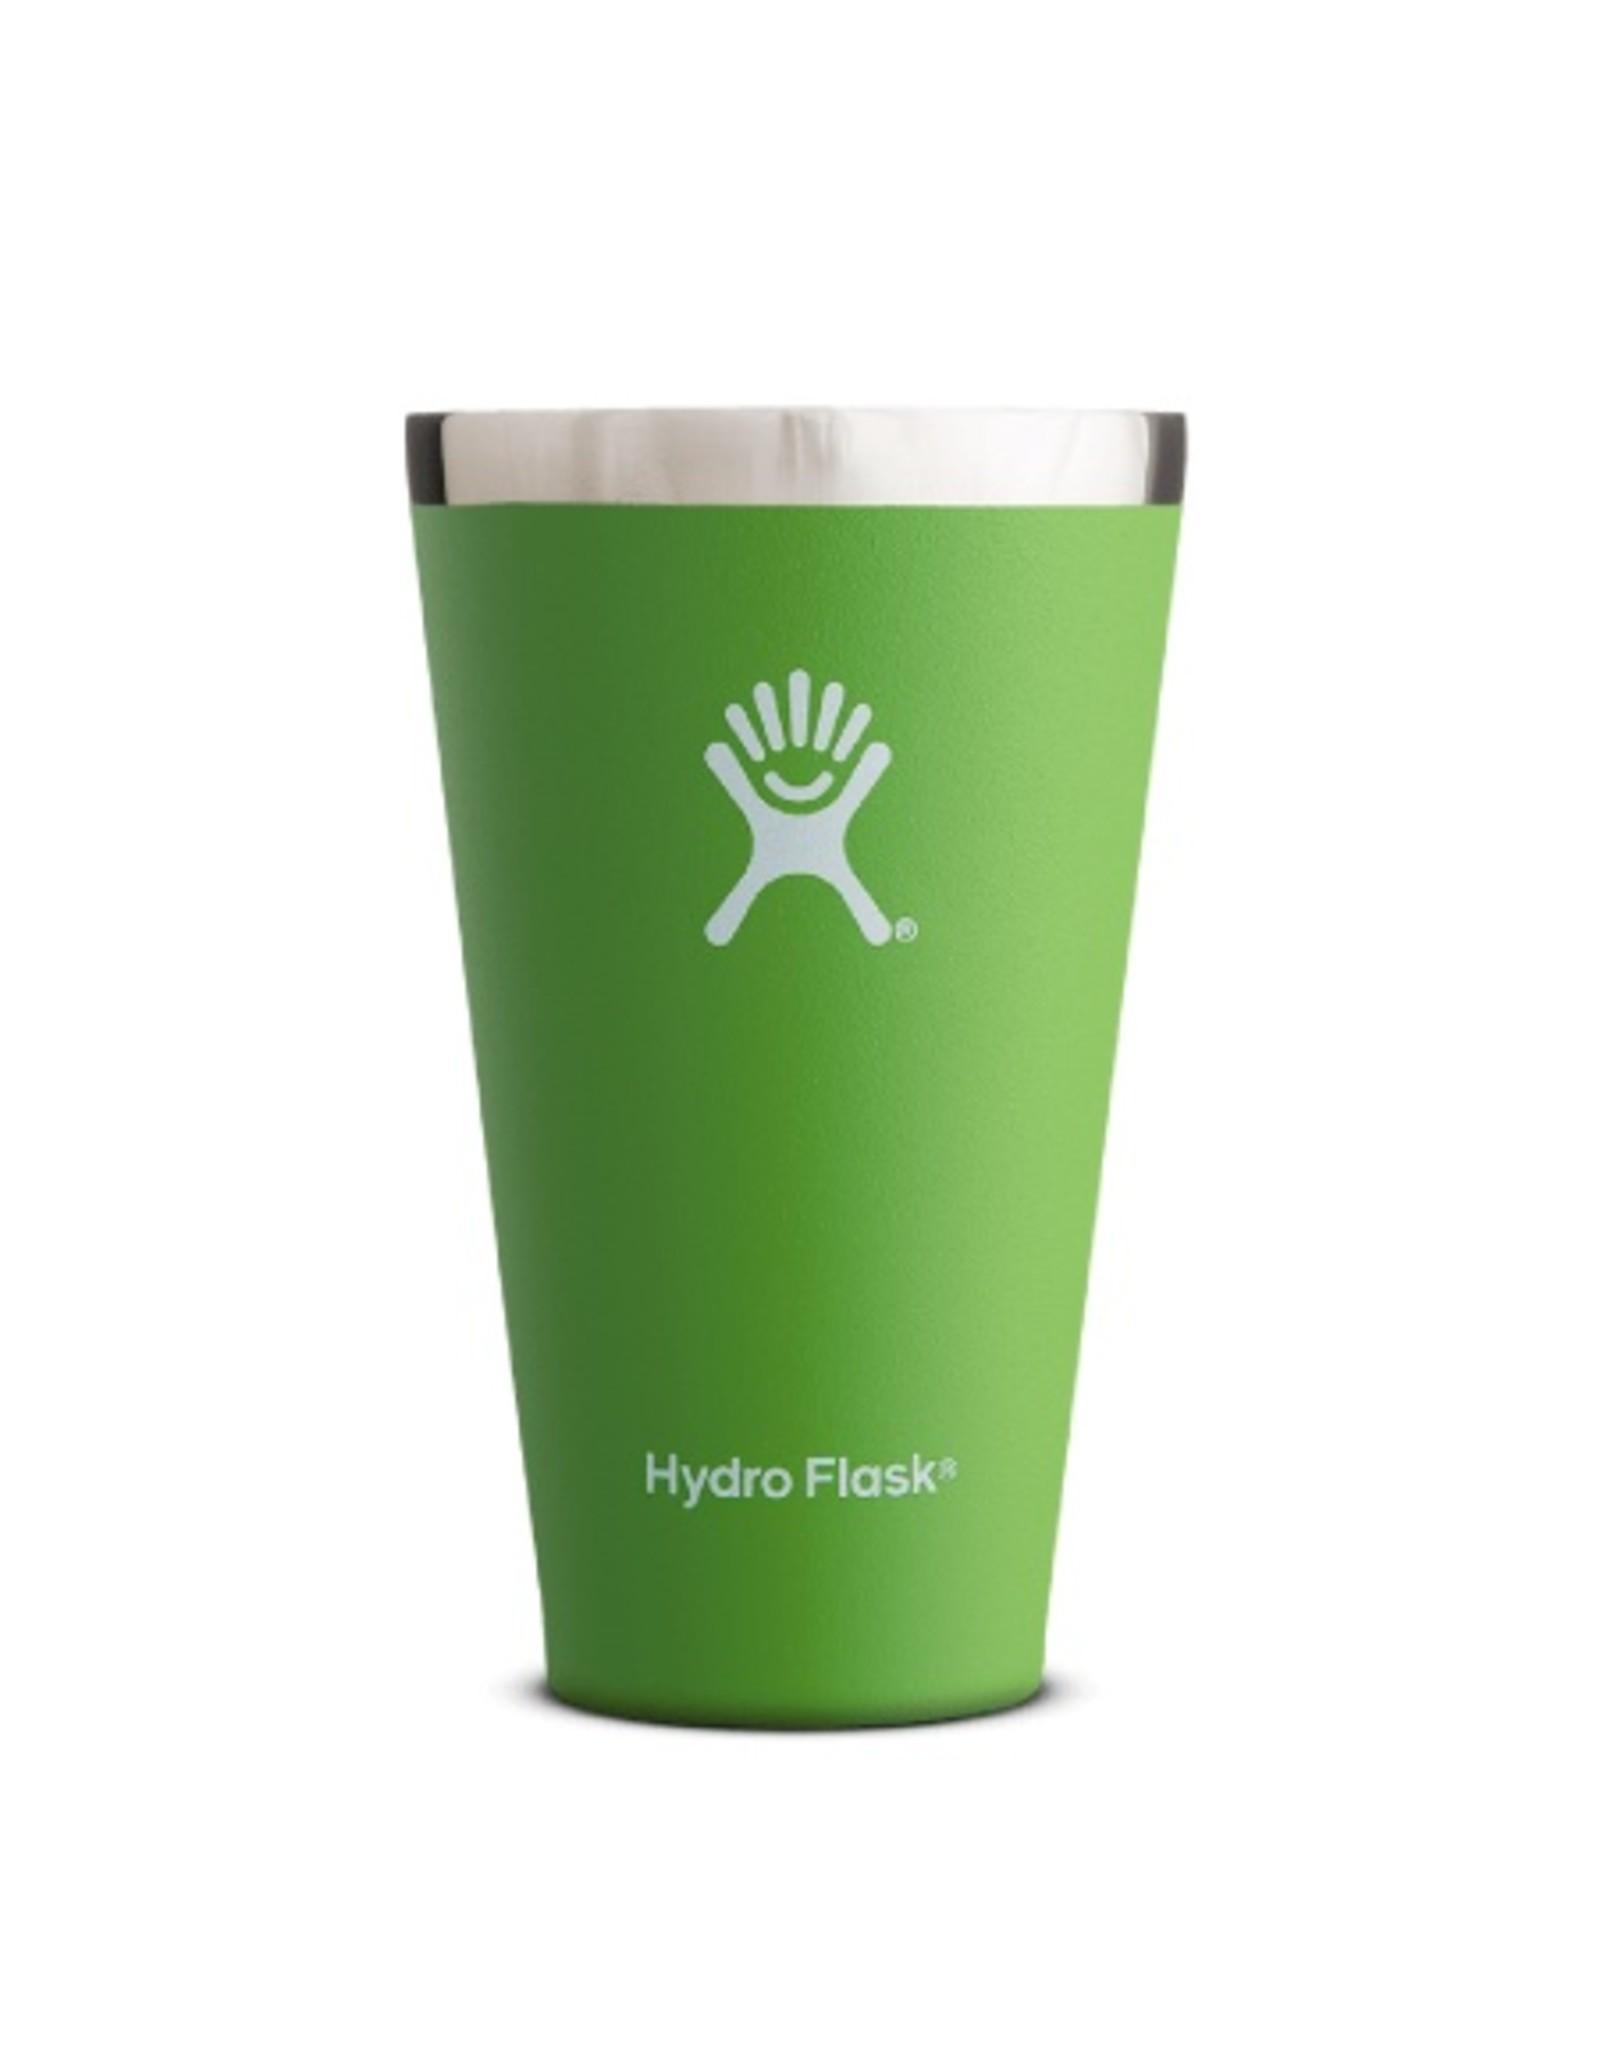 Hydro Flask Hydro Flask True Pint 16oz